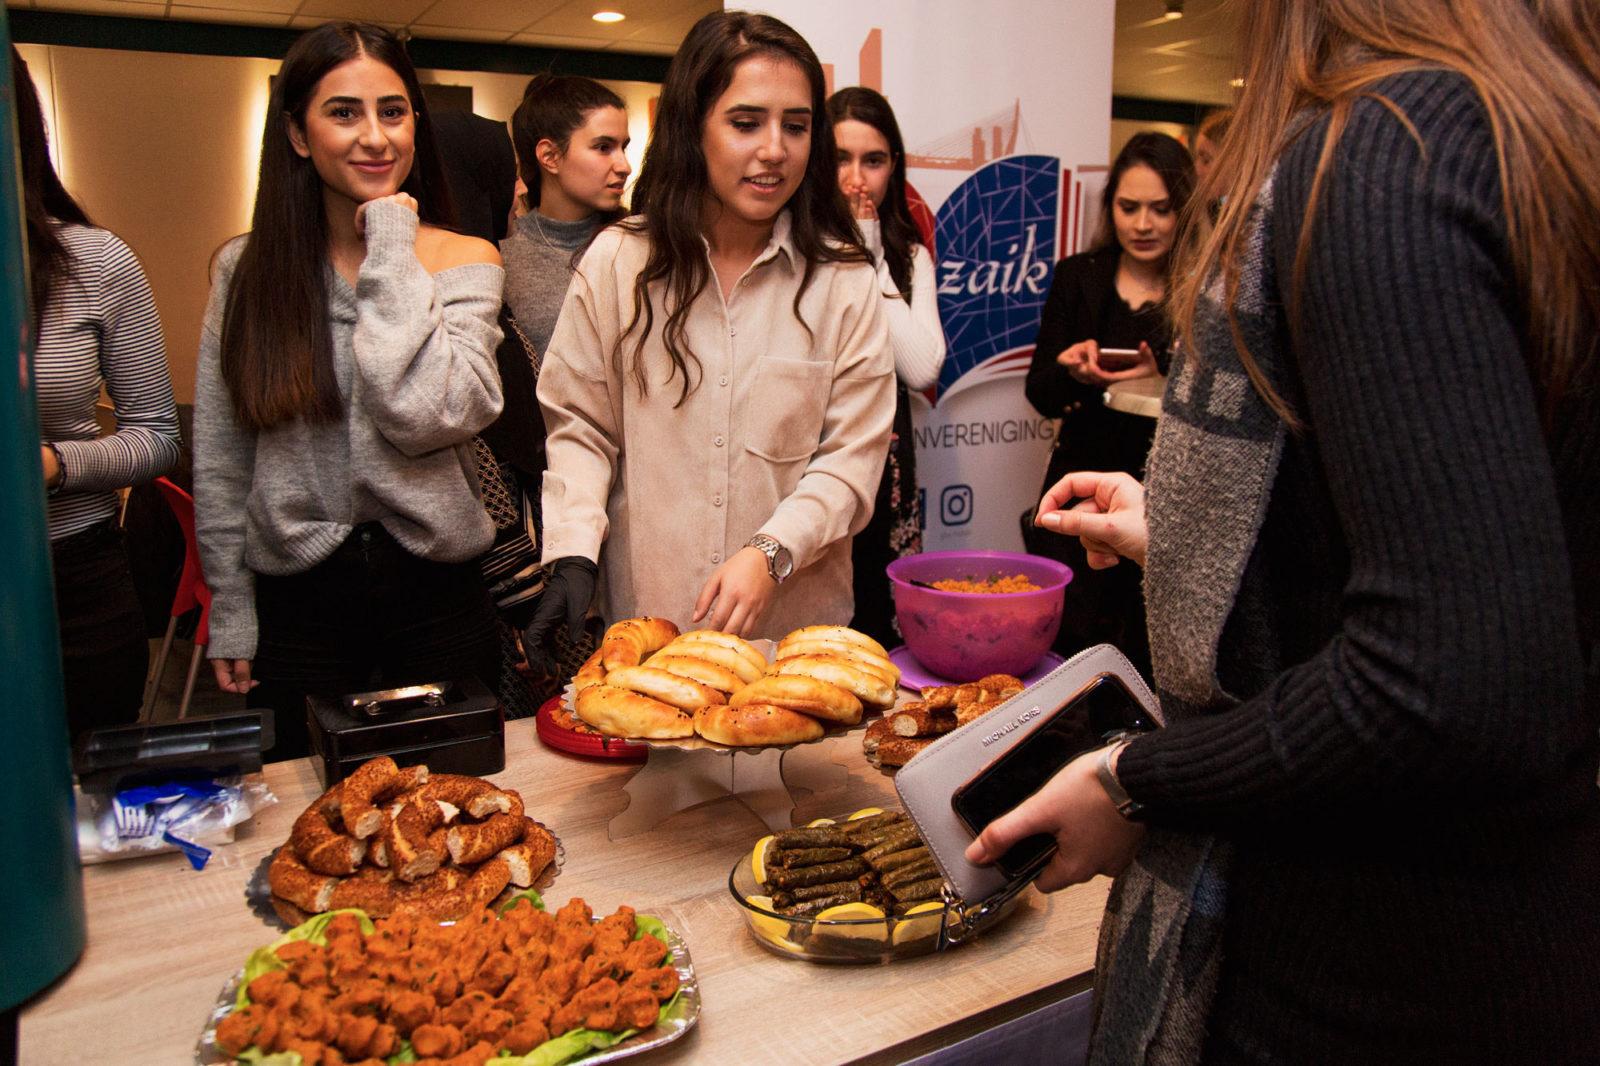 international-food-fair-erasmus-multicultural-associations-ema